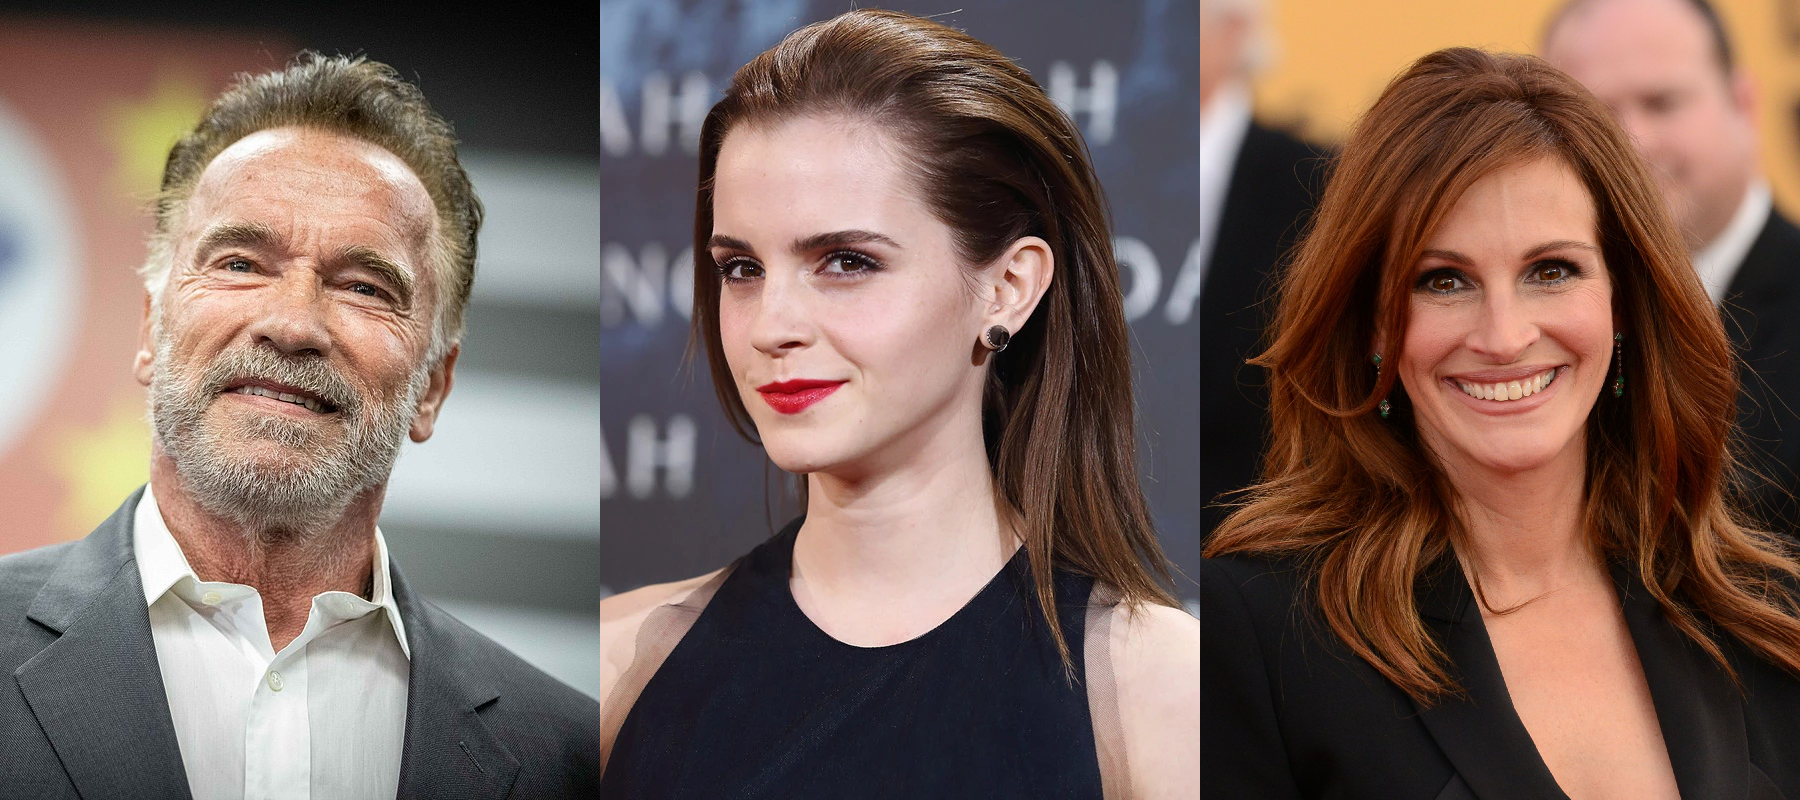 Arnold Schwarzenegger, Emma Watson & Julia Roberts - Des introvertis sociables